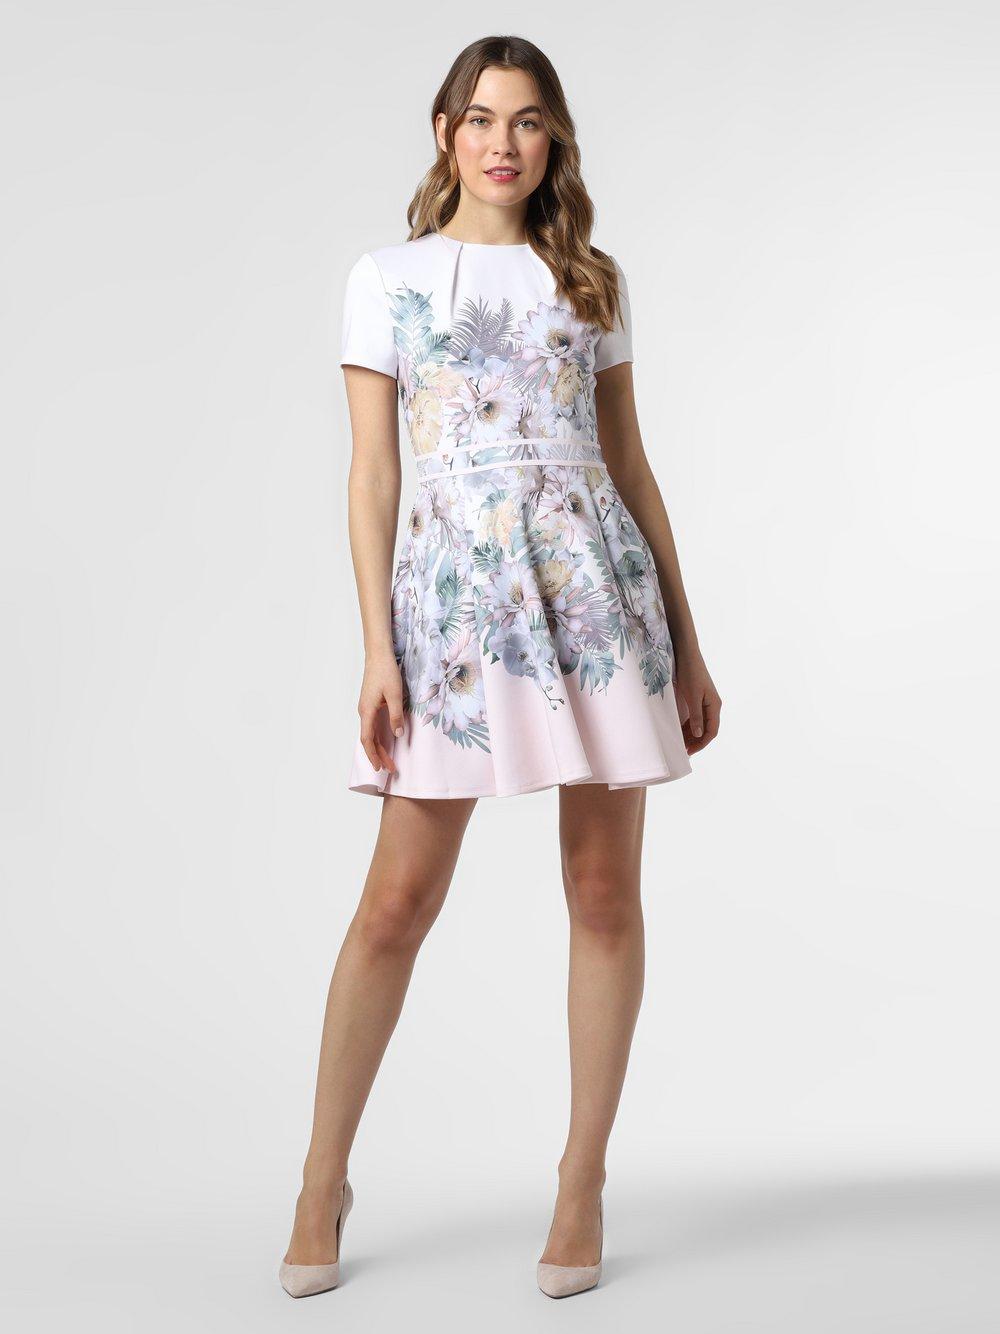 Ted Baker – Sukienka damska – Haylinn, różowy Van Graaf 475287-0001-00380